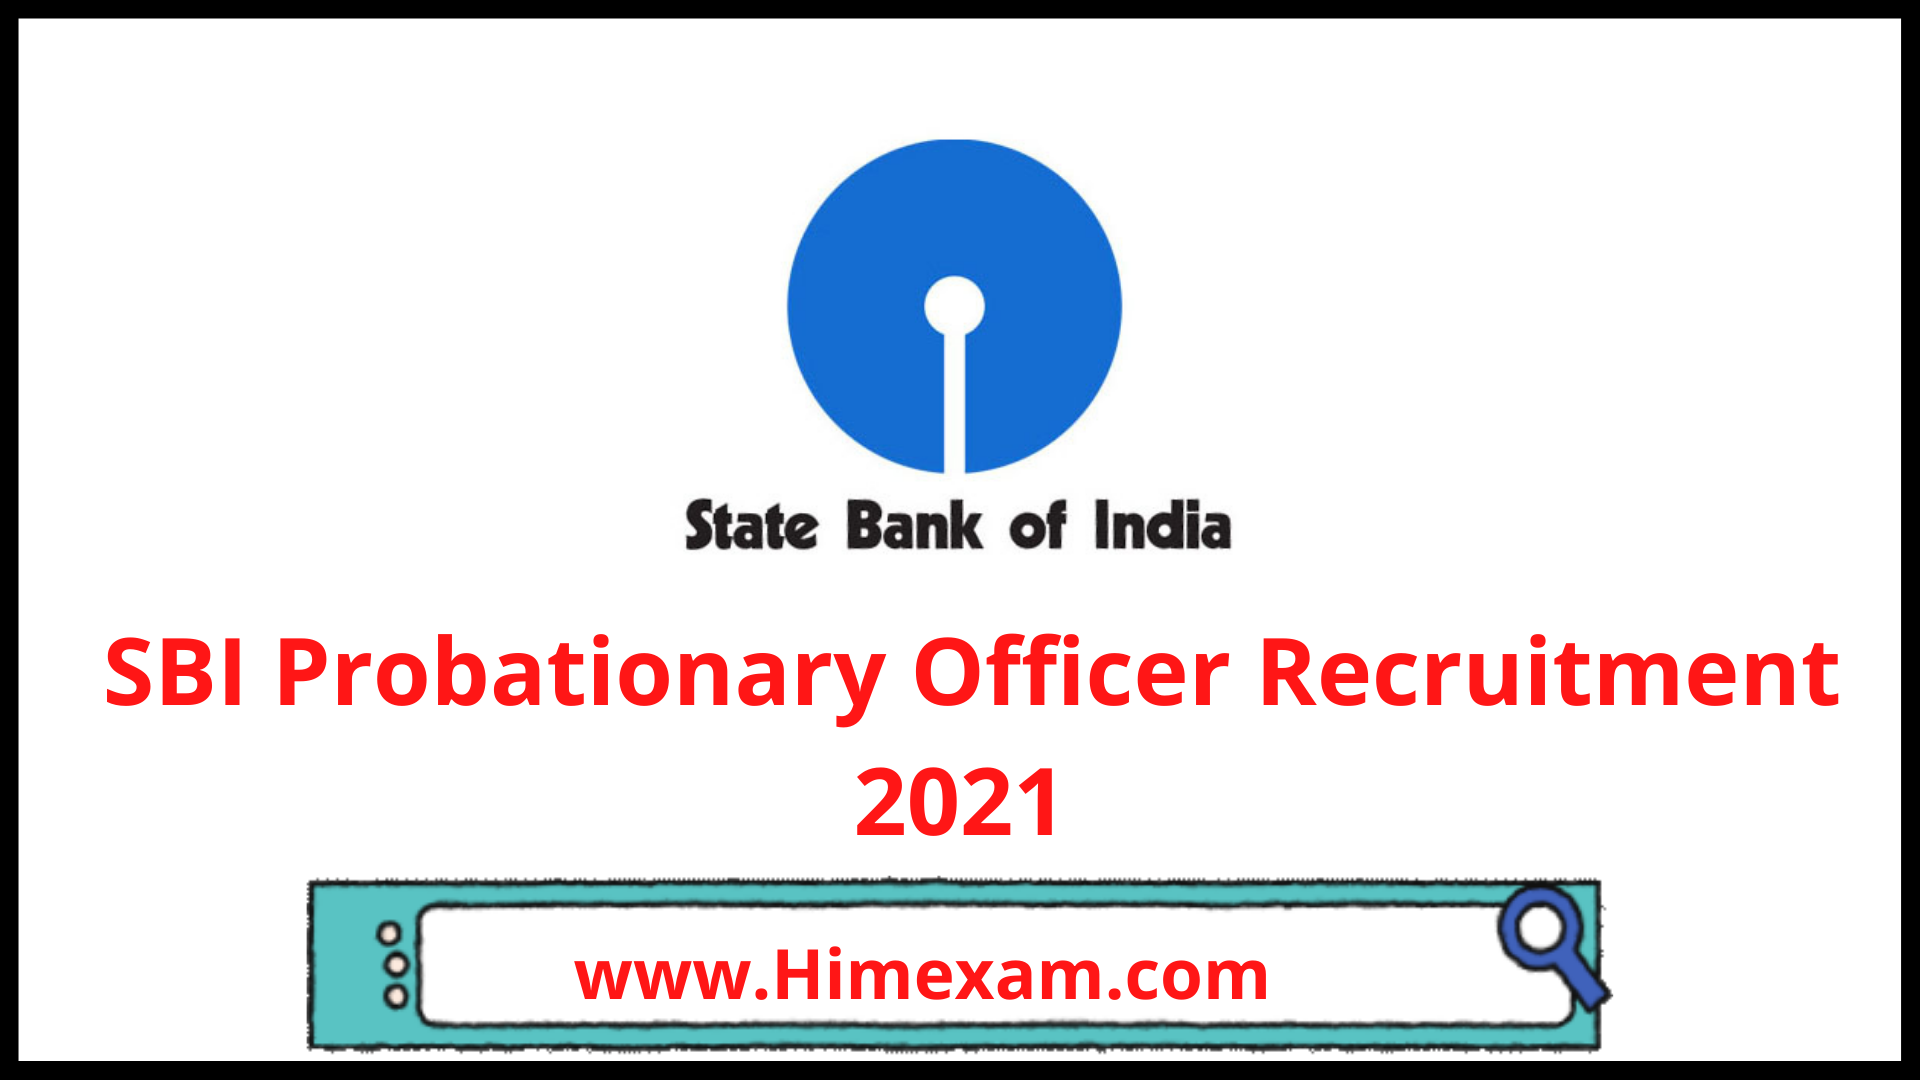 SBI Probationary Officer Recruitment 2021